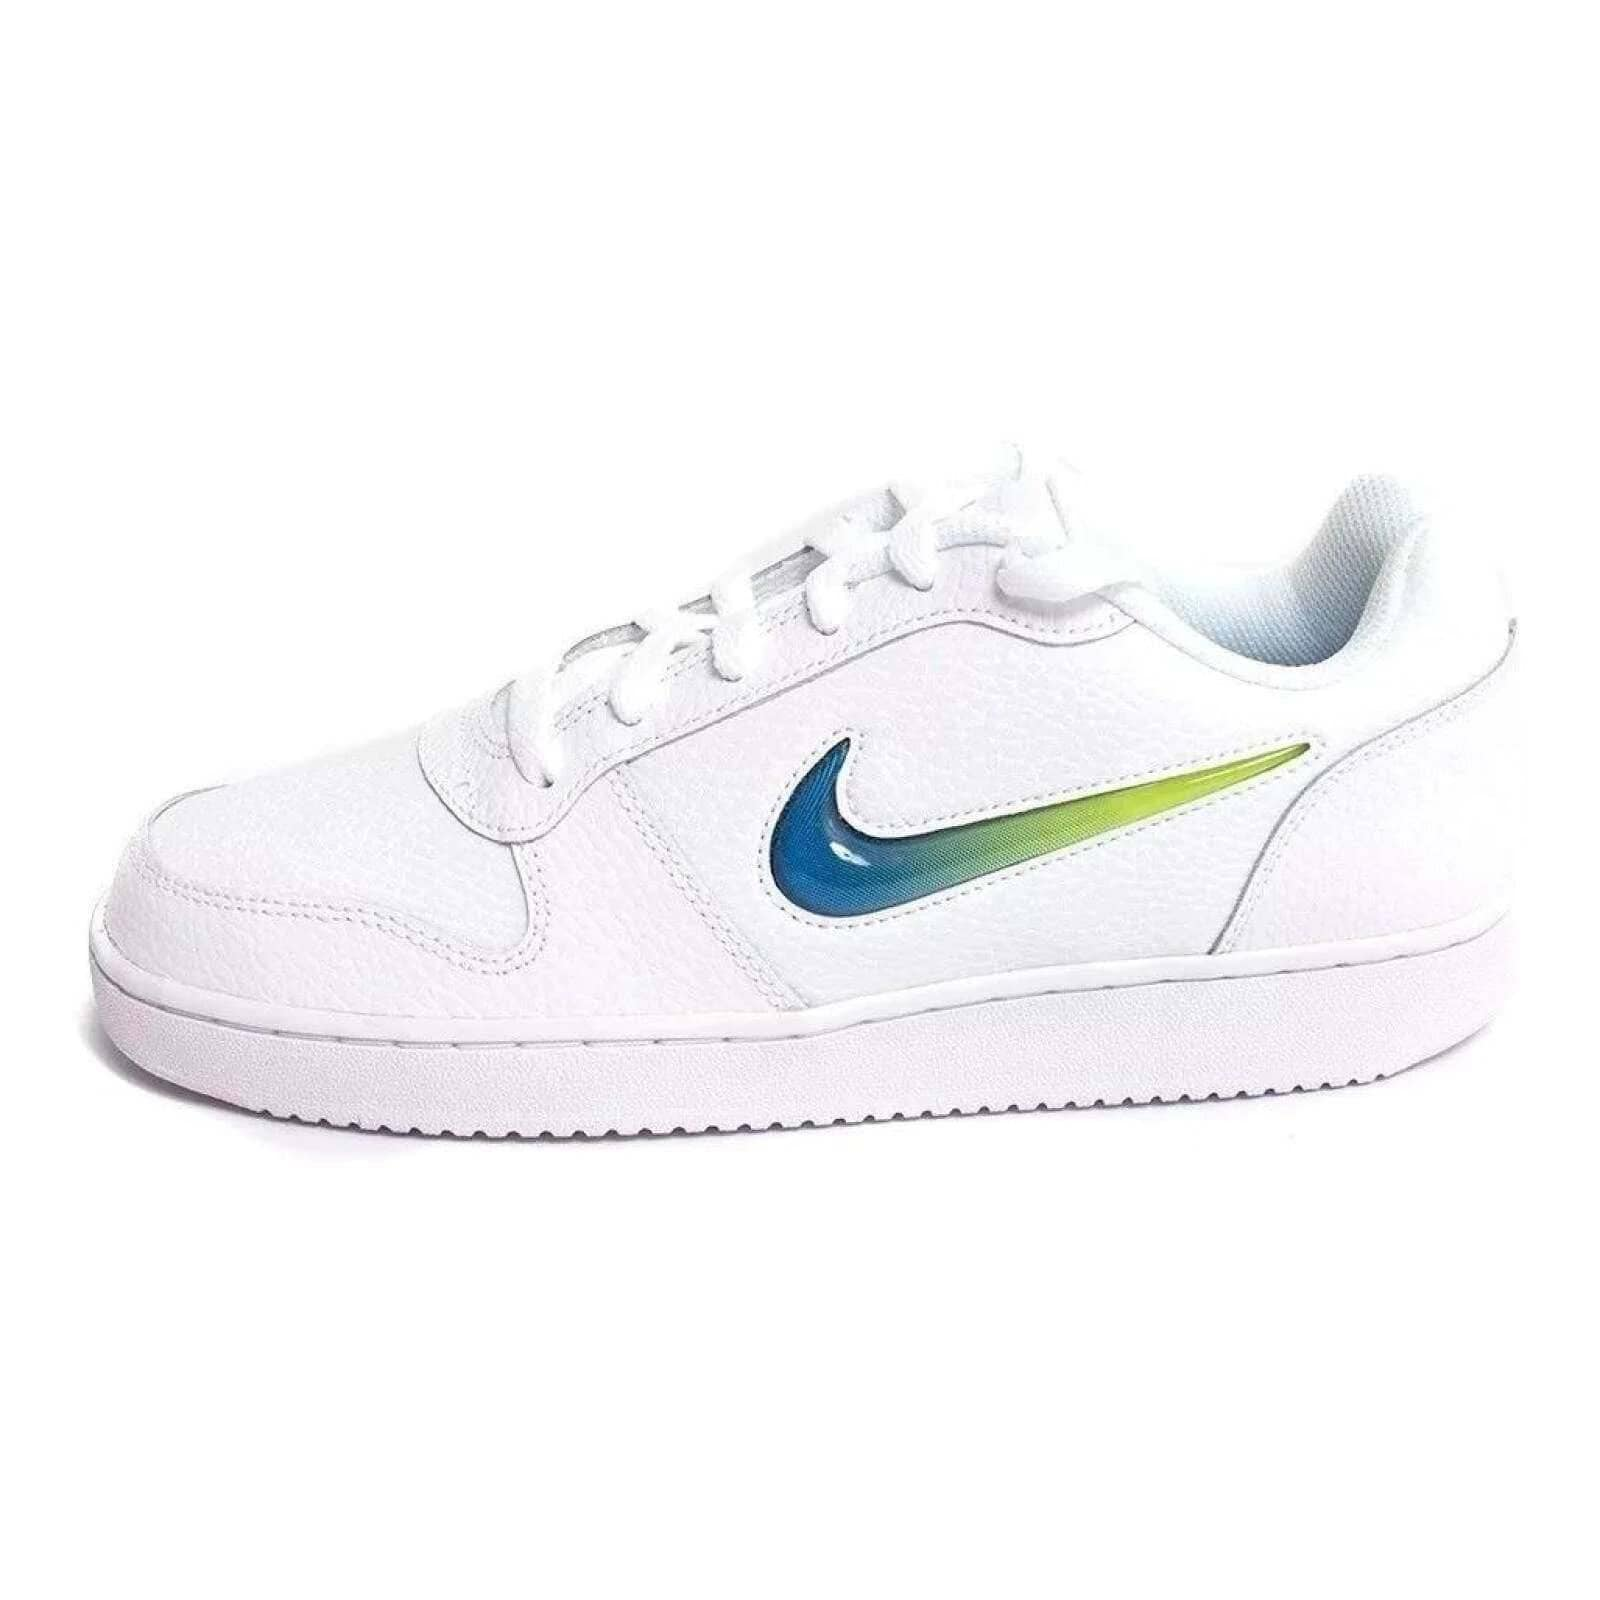 mayor alineación A veces  Tenis Nike Ebernon Low Prem Moda Casuales Hombre